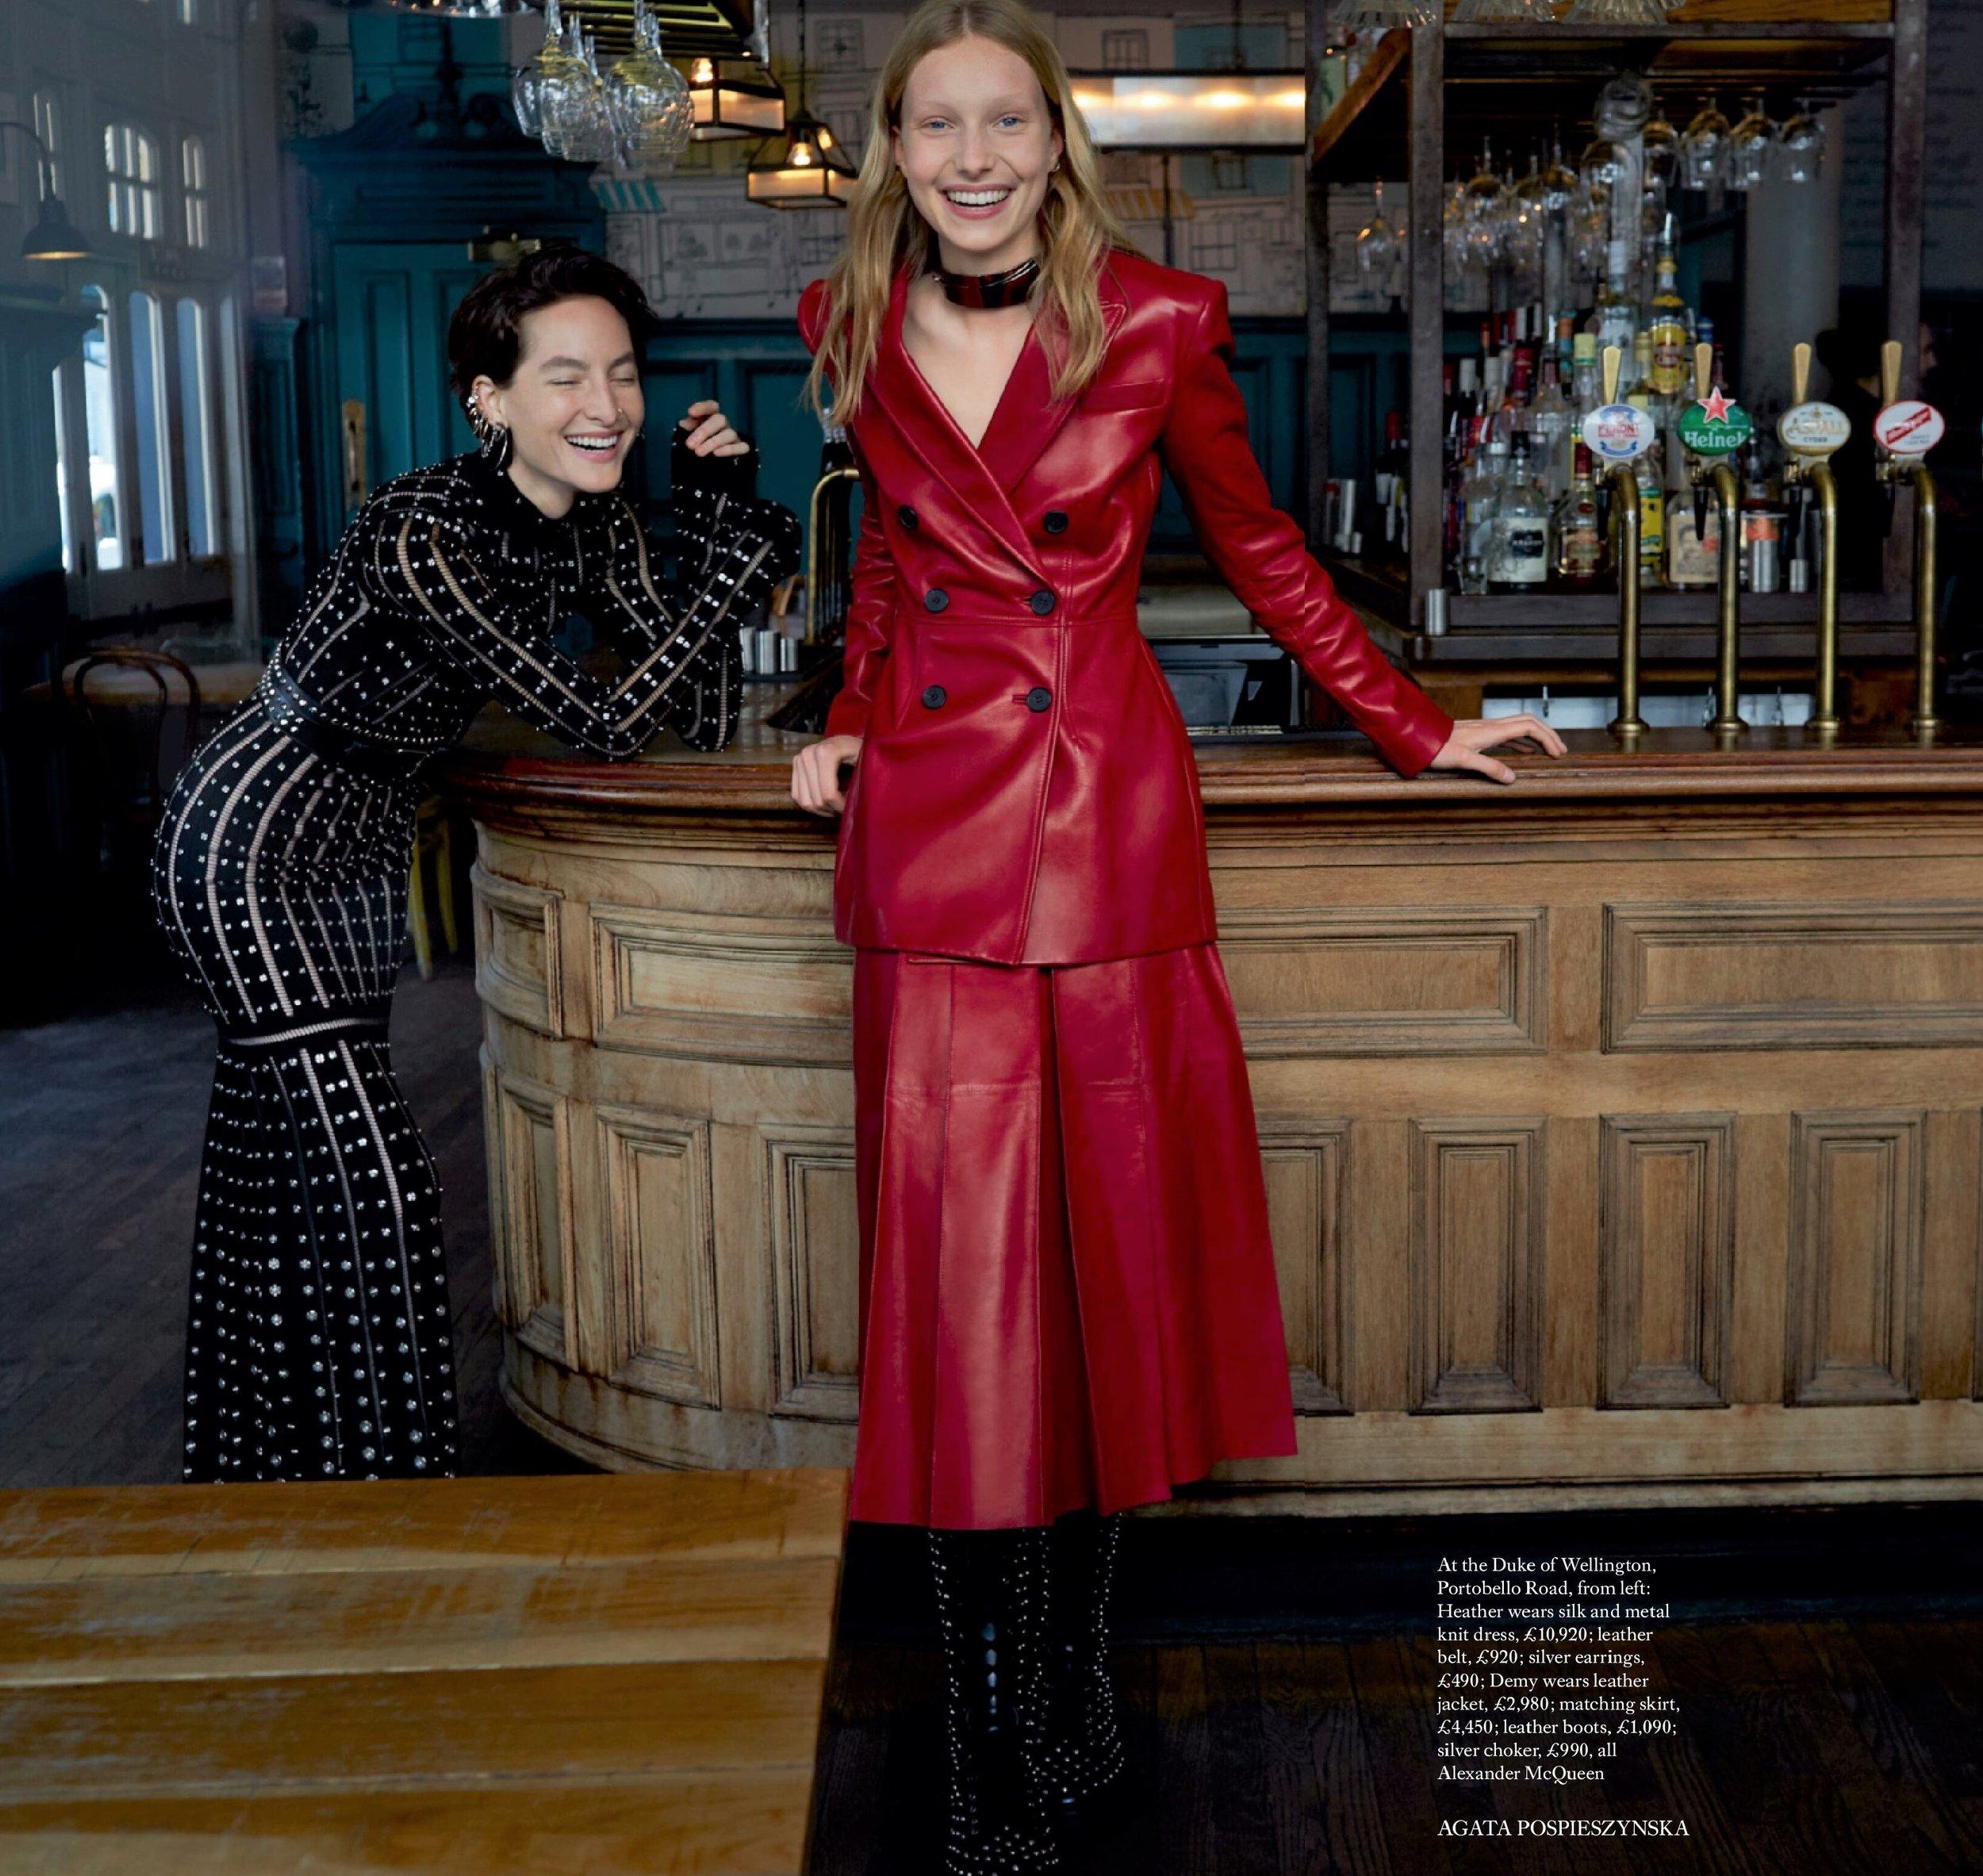 Agata Popieszynska-Girls Are Back in Town Harper's Bazaar UK Aug 2019 (25).jpg